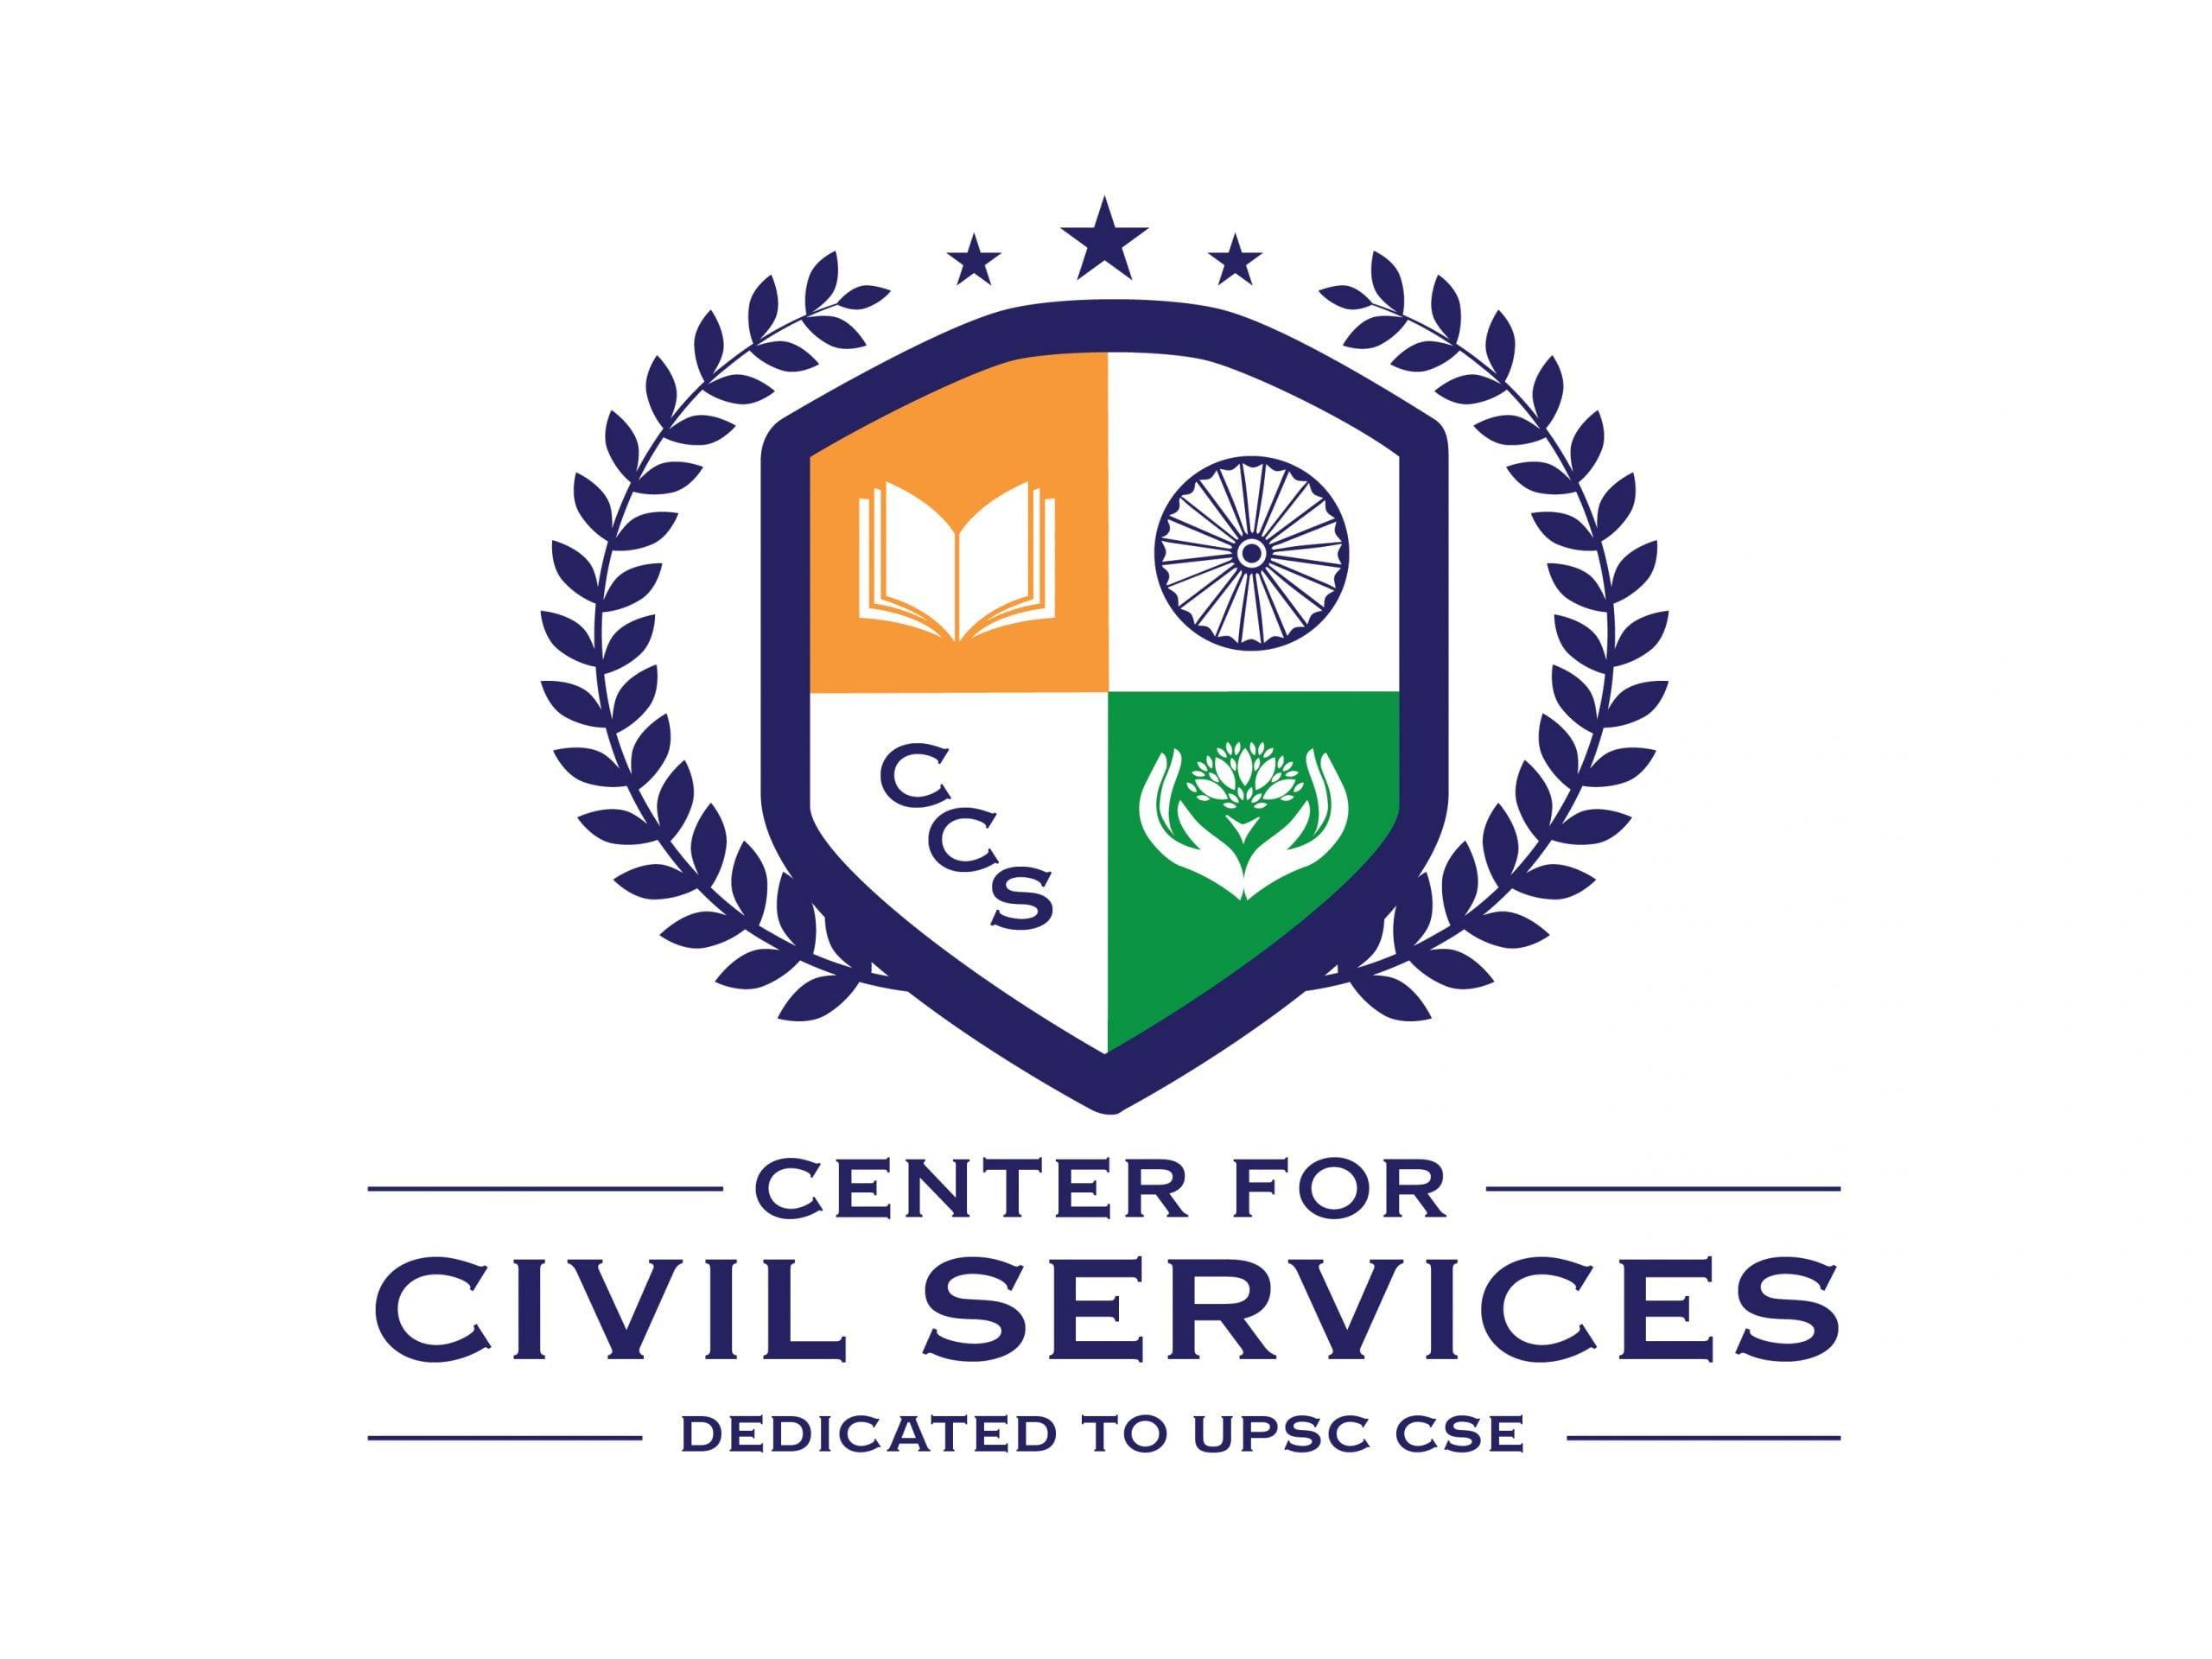 Center For Civil Services